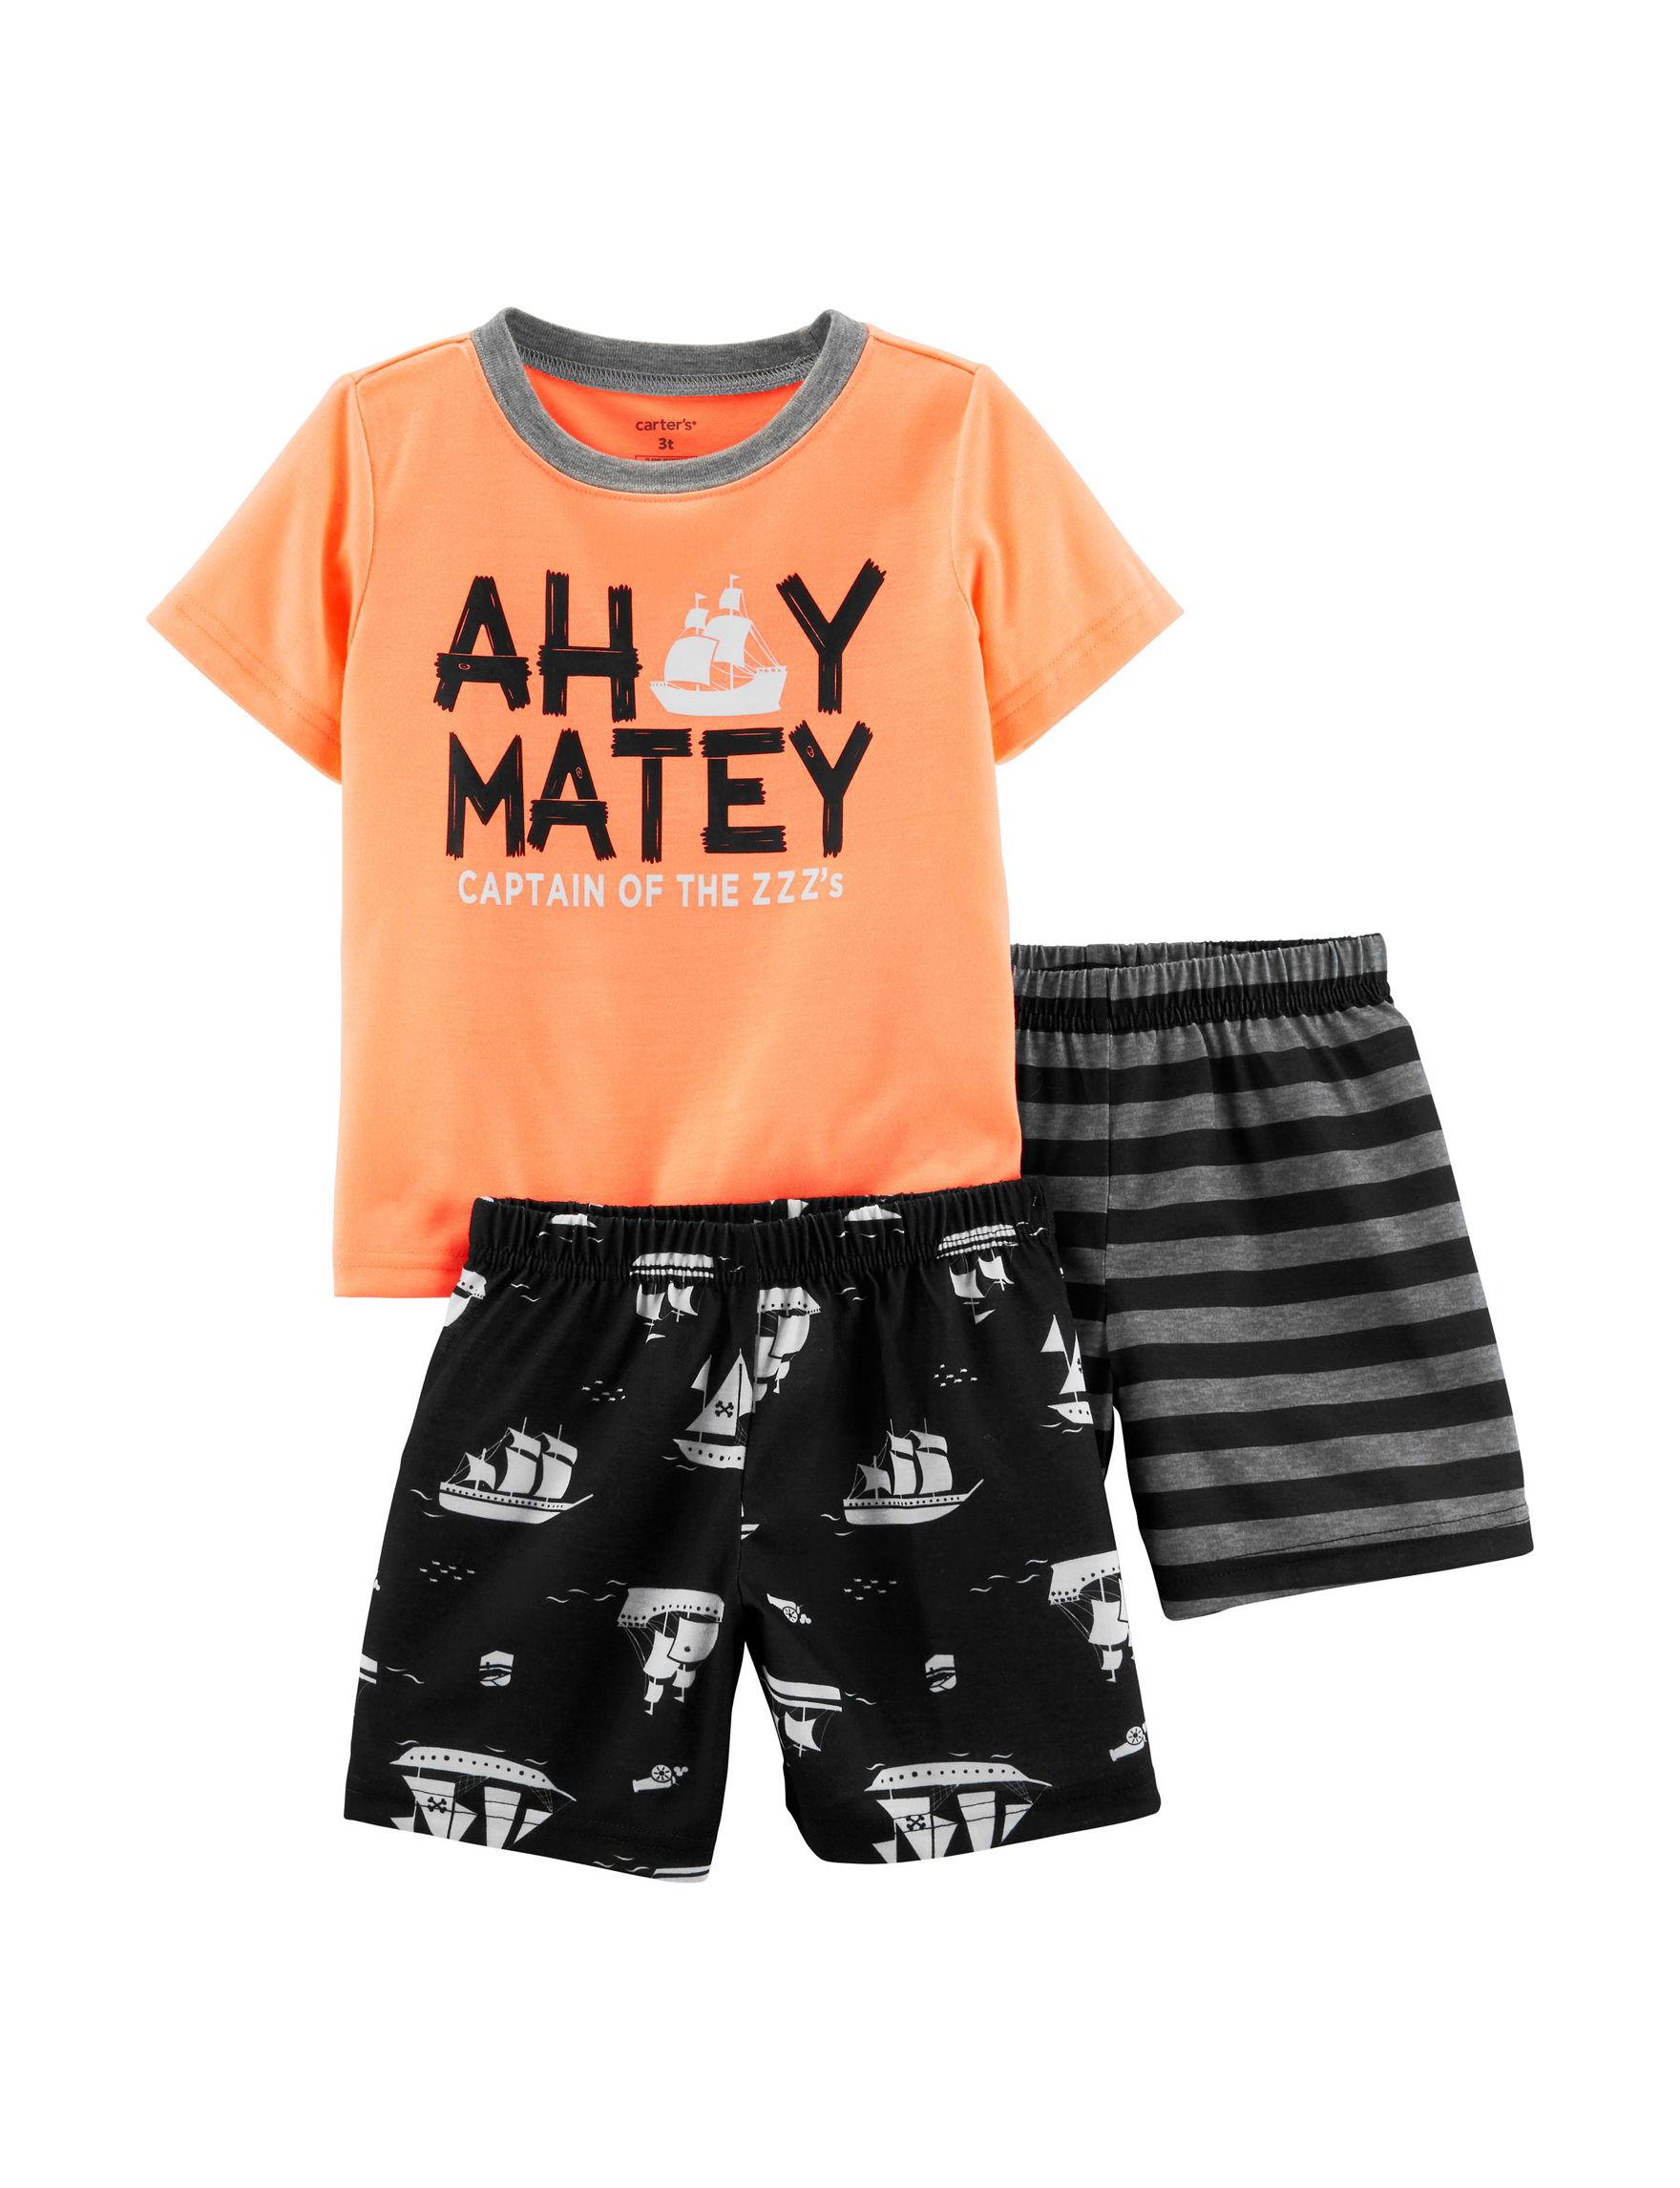 Carter's Orange / Black Pajama Sets